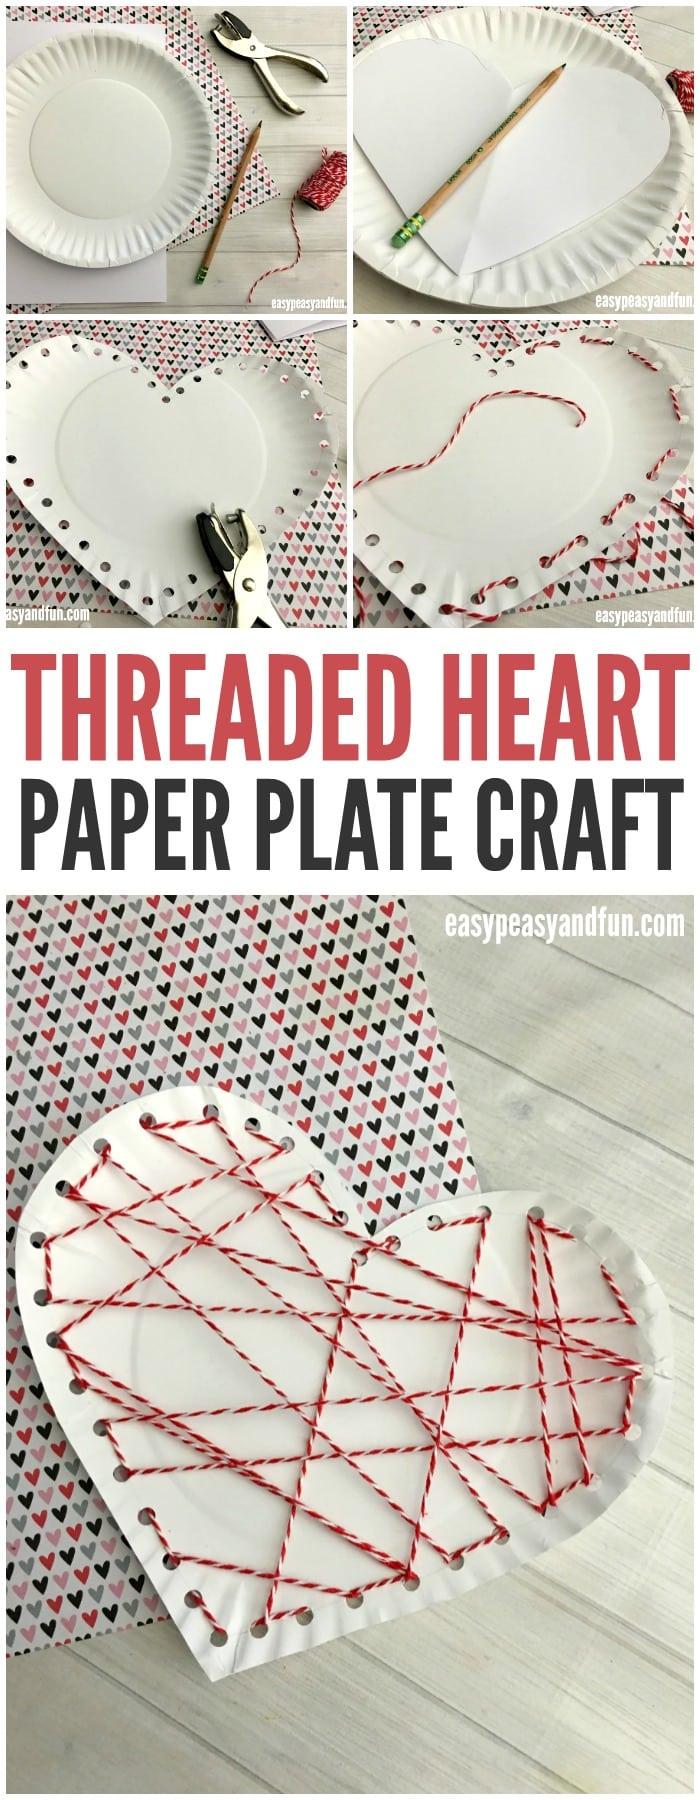 sewing valentine's day craft